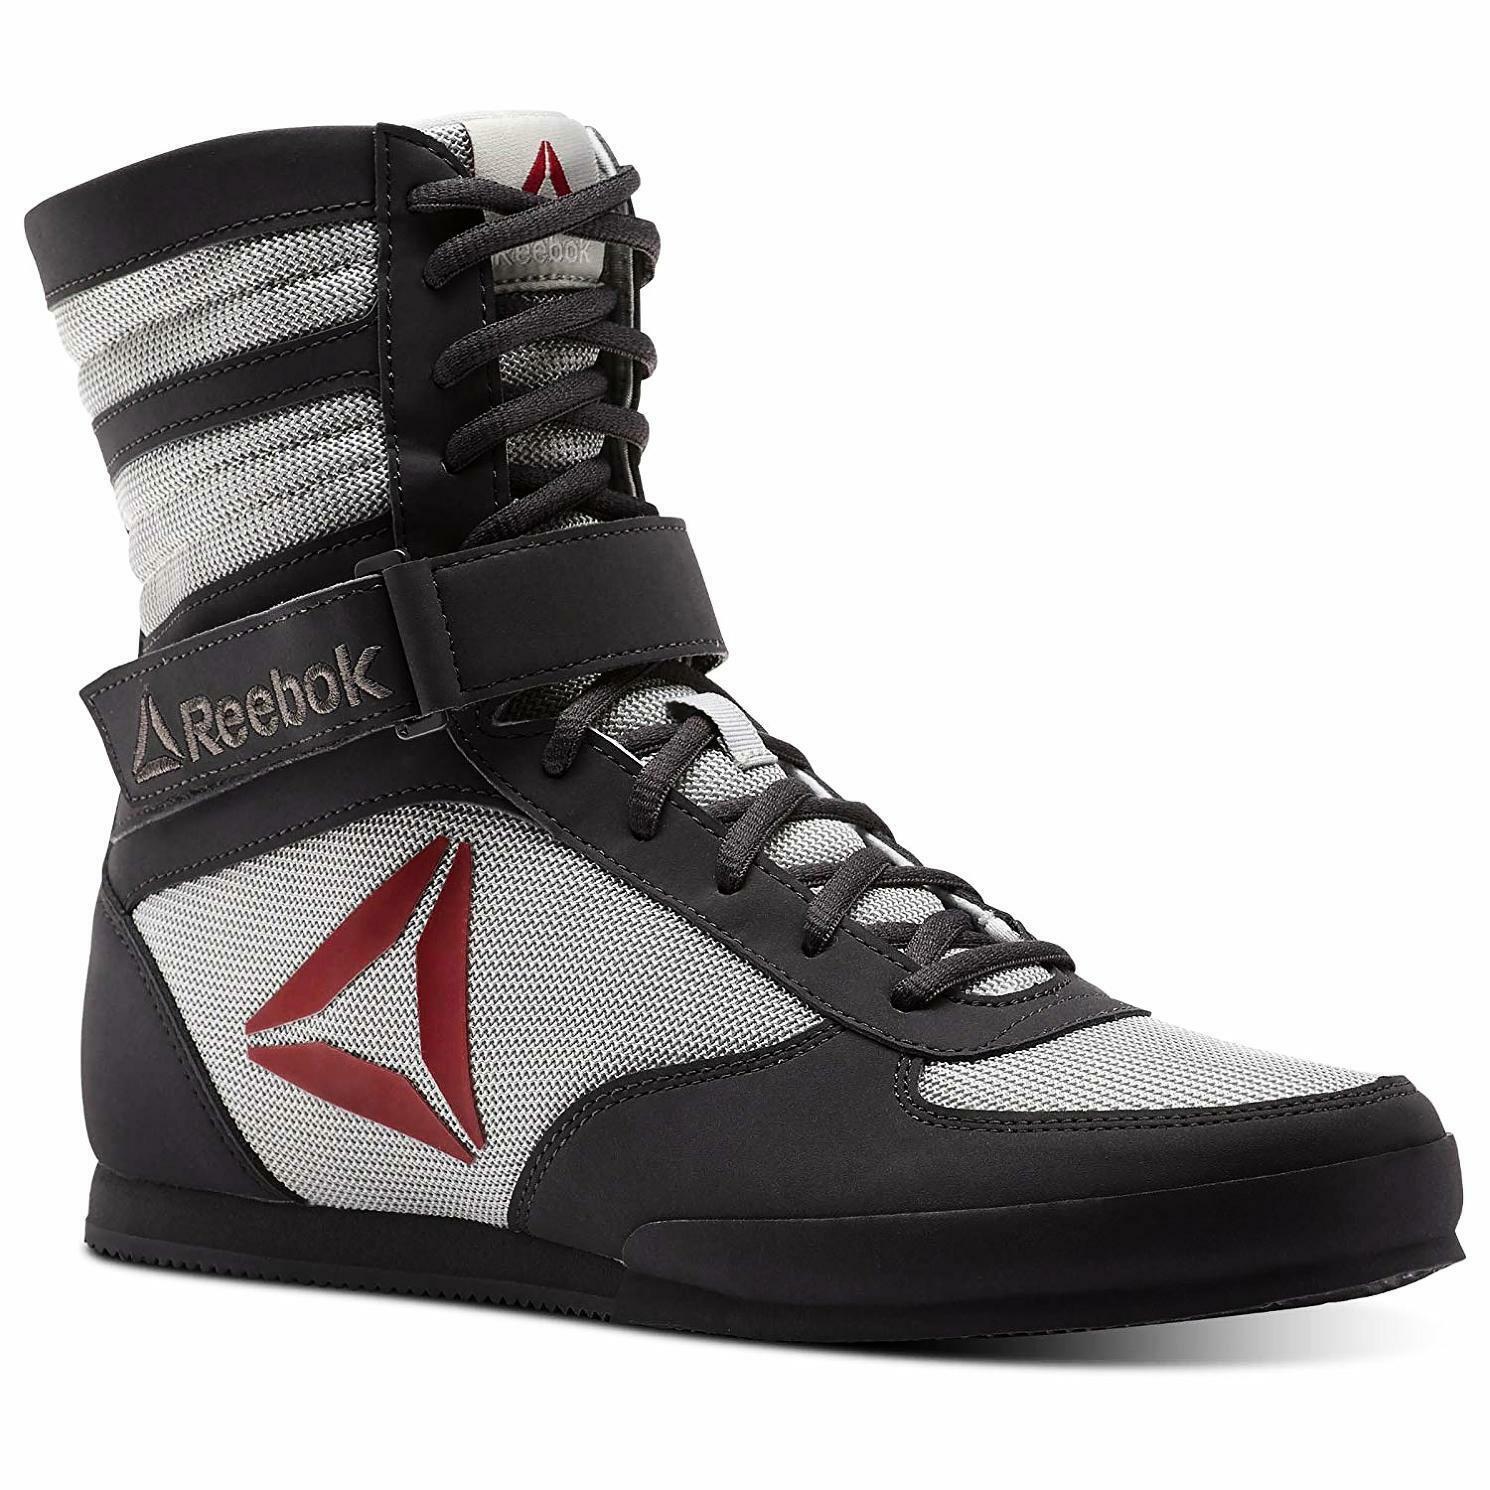 Reebok Men's Boxing Boot-Buck Cross Trainer - Choose SZ color